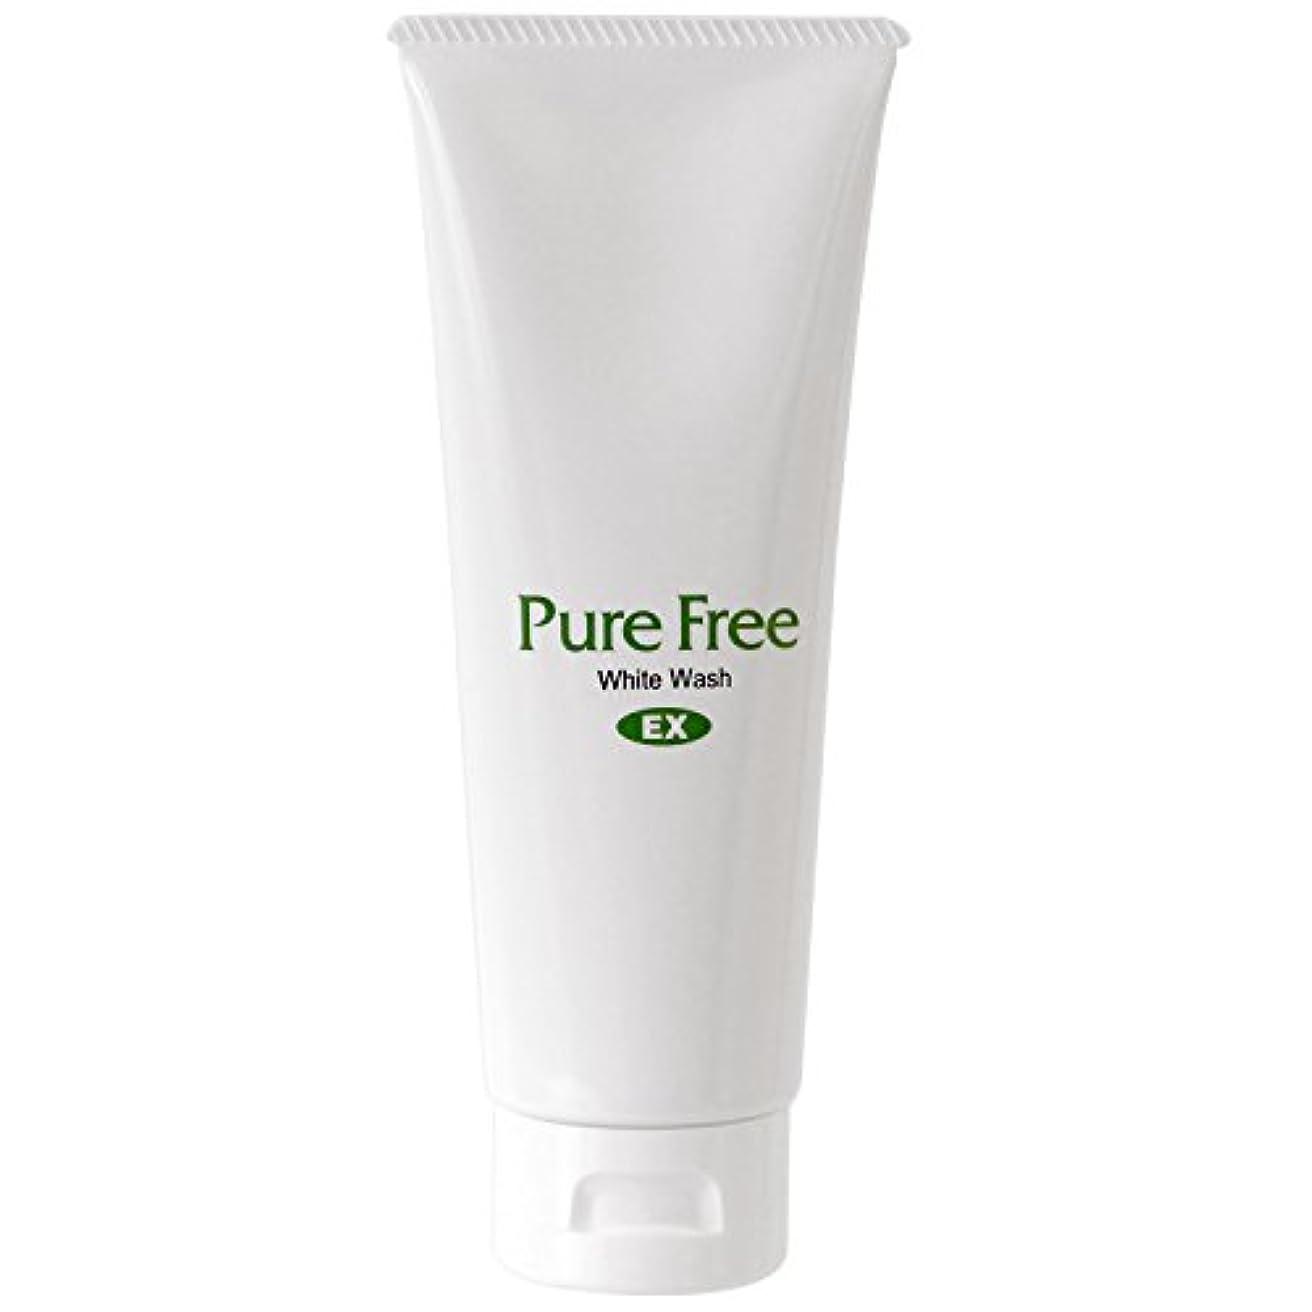 Pure Free (ピュアフリー) ホワイトウォッシュEX オーガニック 正規品 洗顔料 (サンプル用意あり)